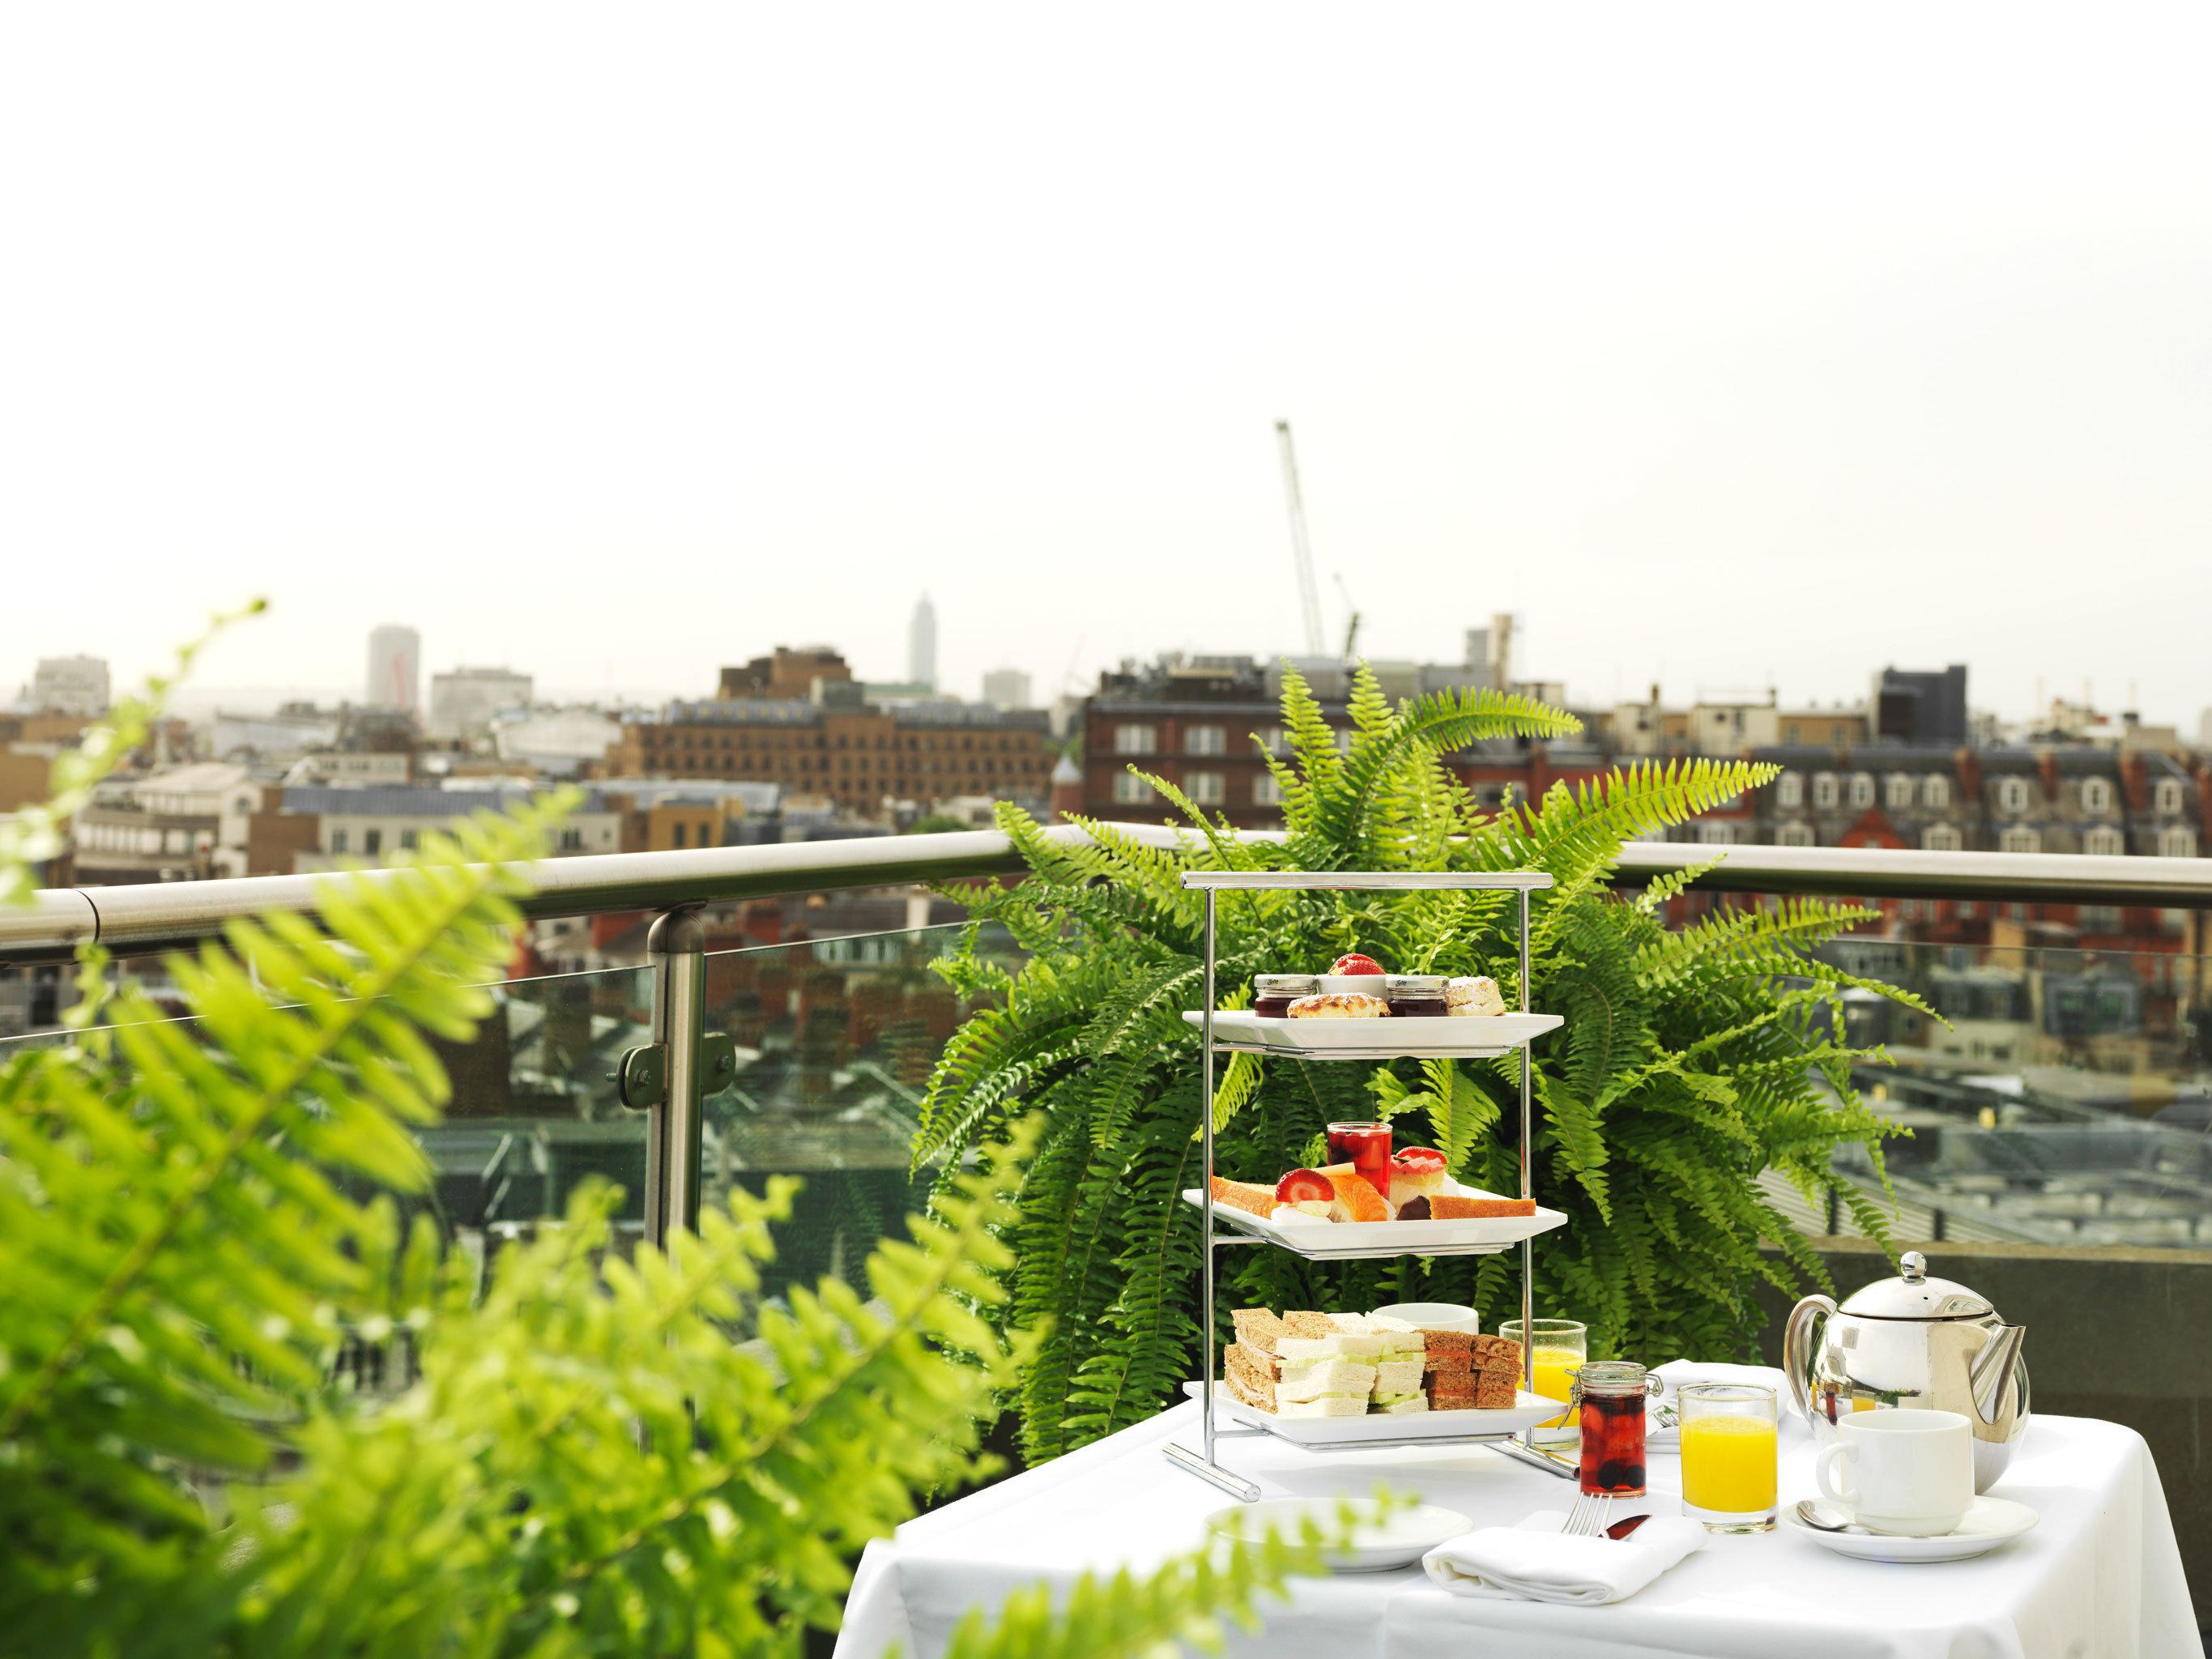 Dining Drink Eat Modern sky Resort flower